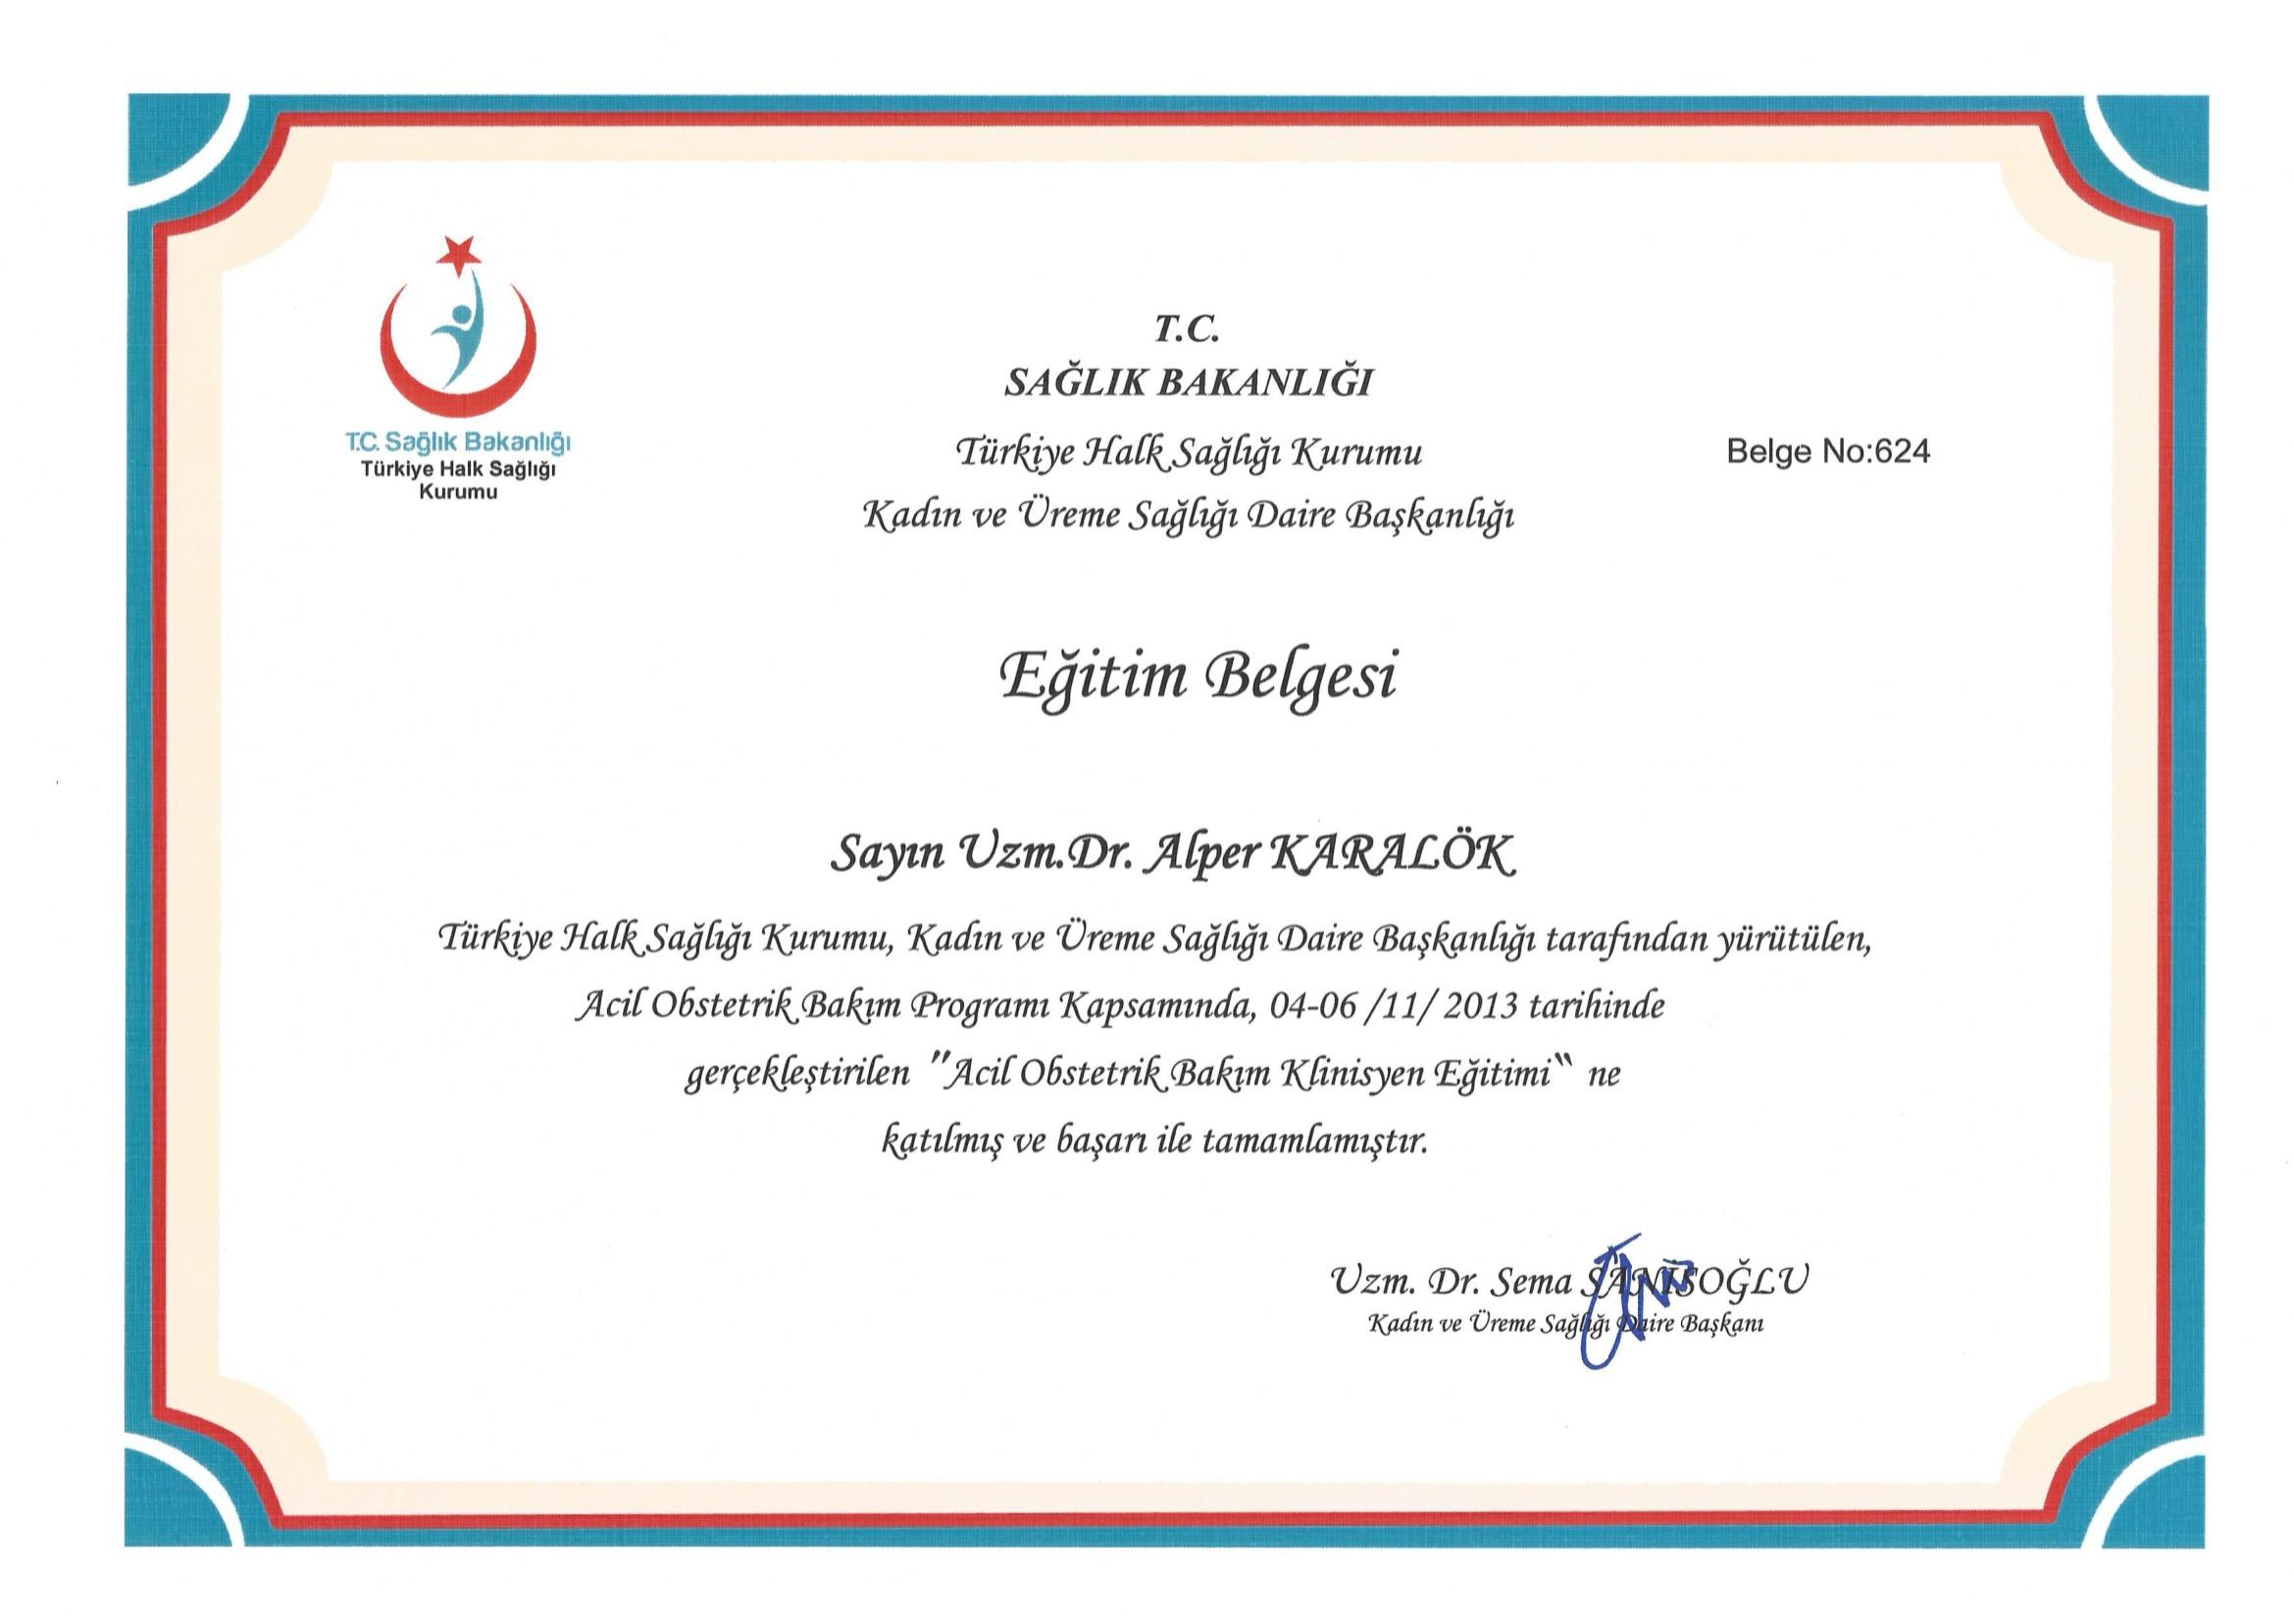 acil_obstetrik_bakım-1_edited